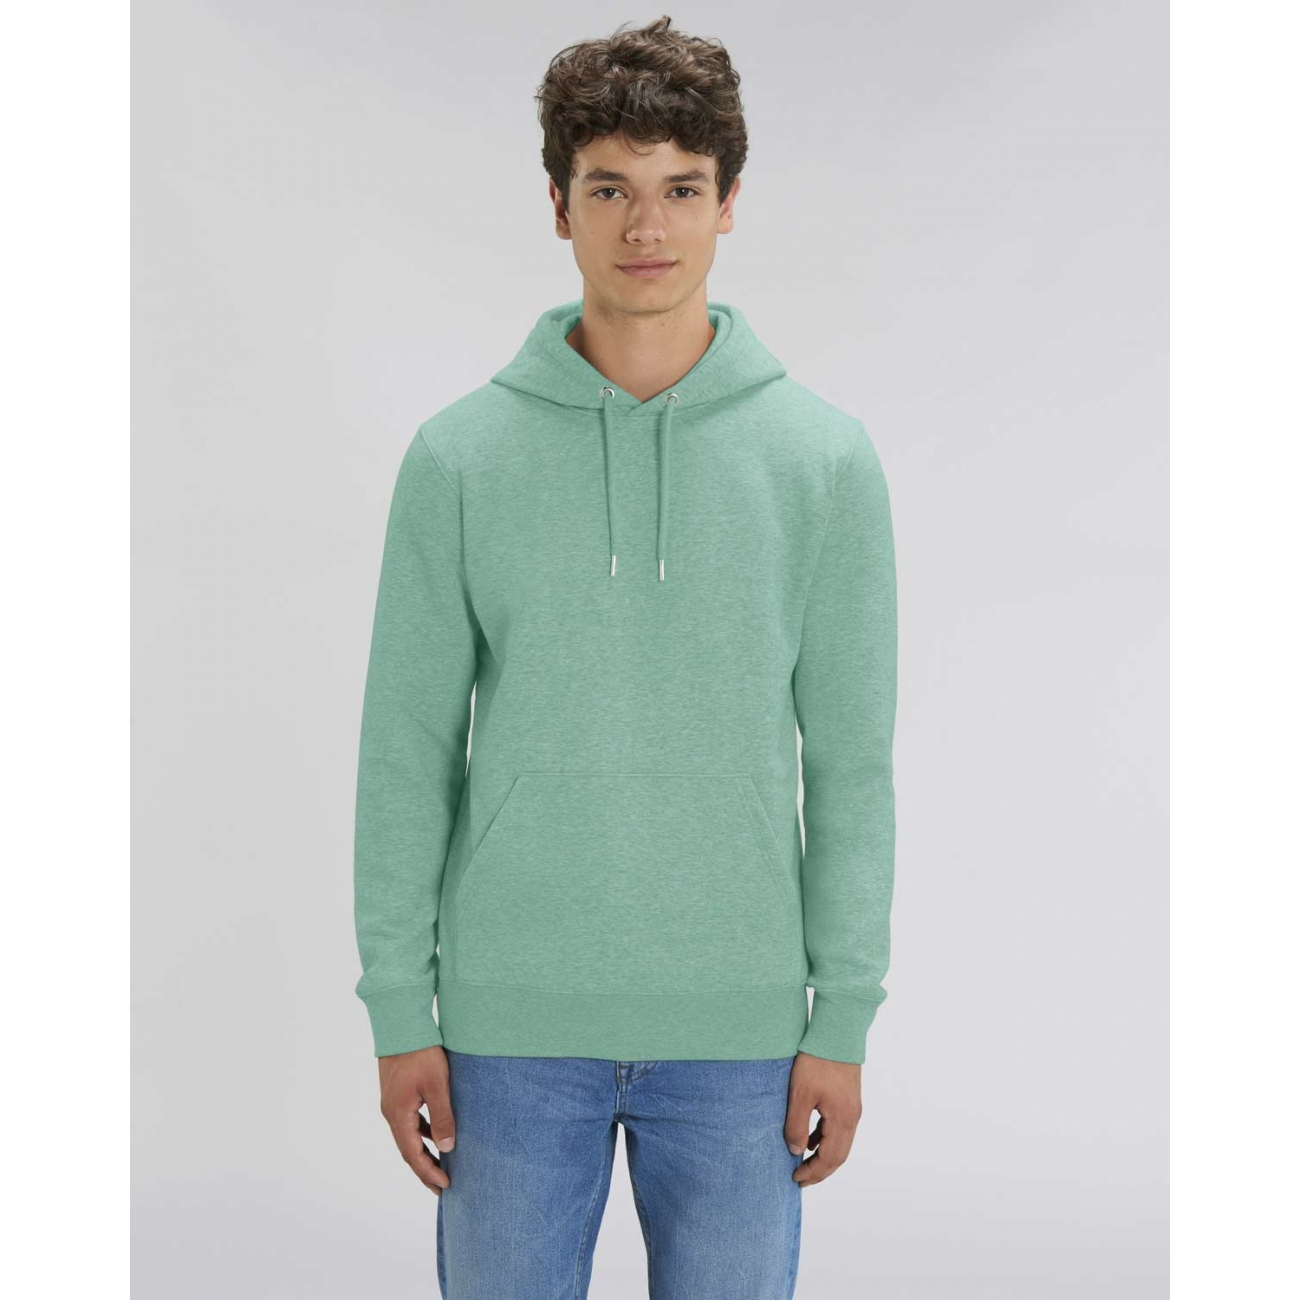 https://tee-shirt-bio.com/7188-thickbox_default/sweat-shirt-capuche-epais-et-interieur-doux-coton-bio-vert-clair-chine-cruiser.jpg